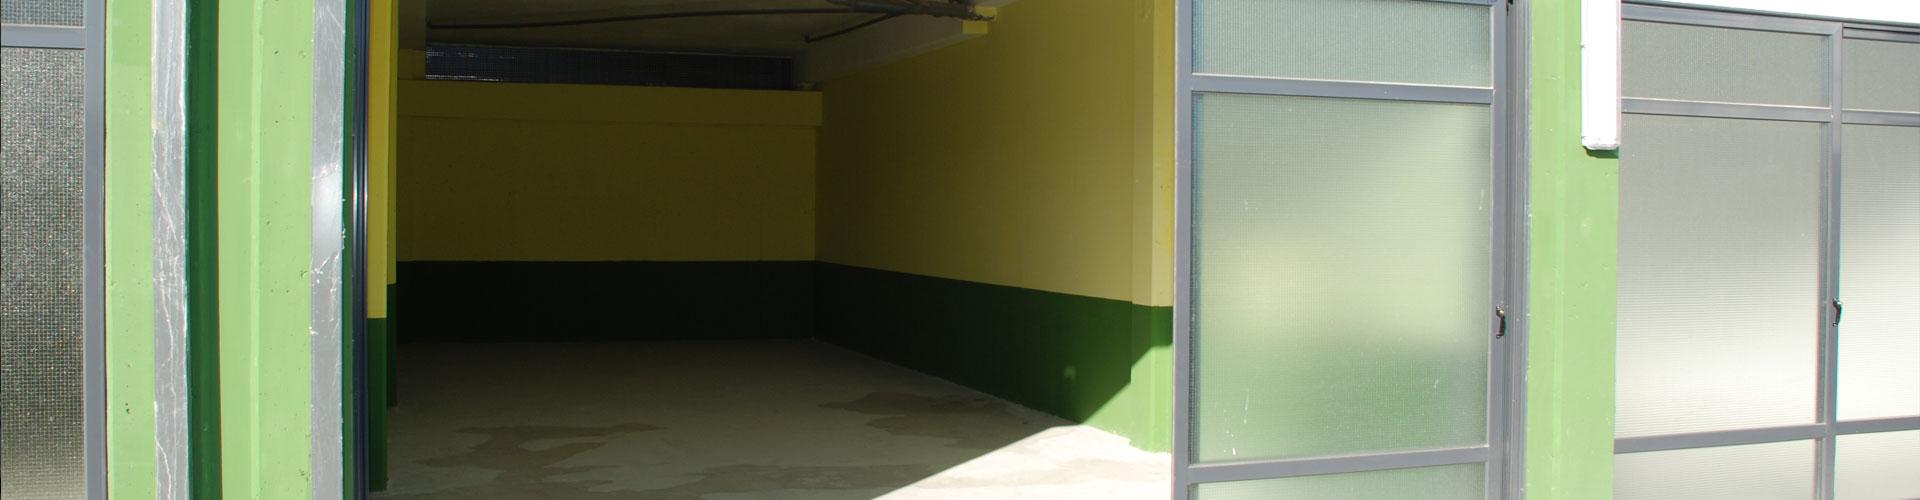 Alquiler-garajes-san-sebastian-de-los-reyes